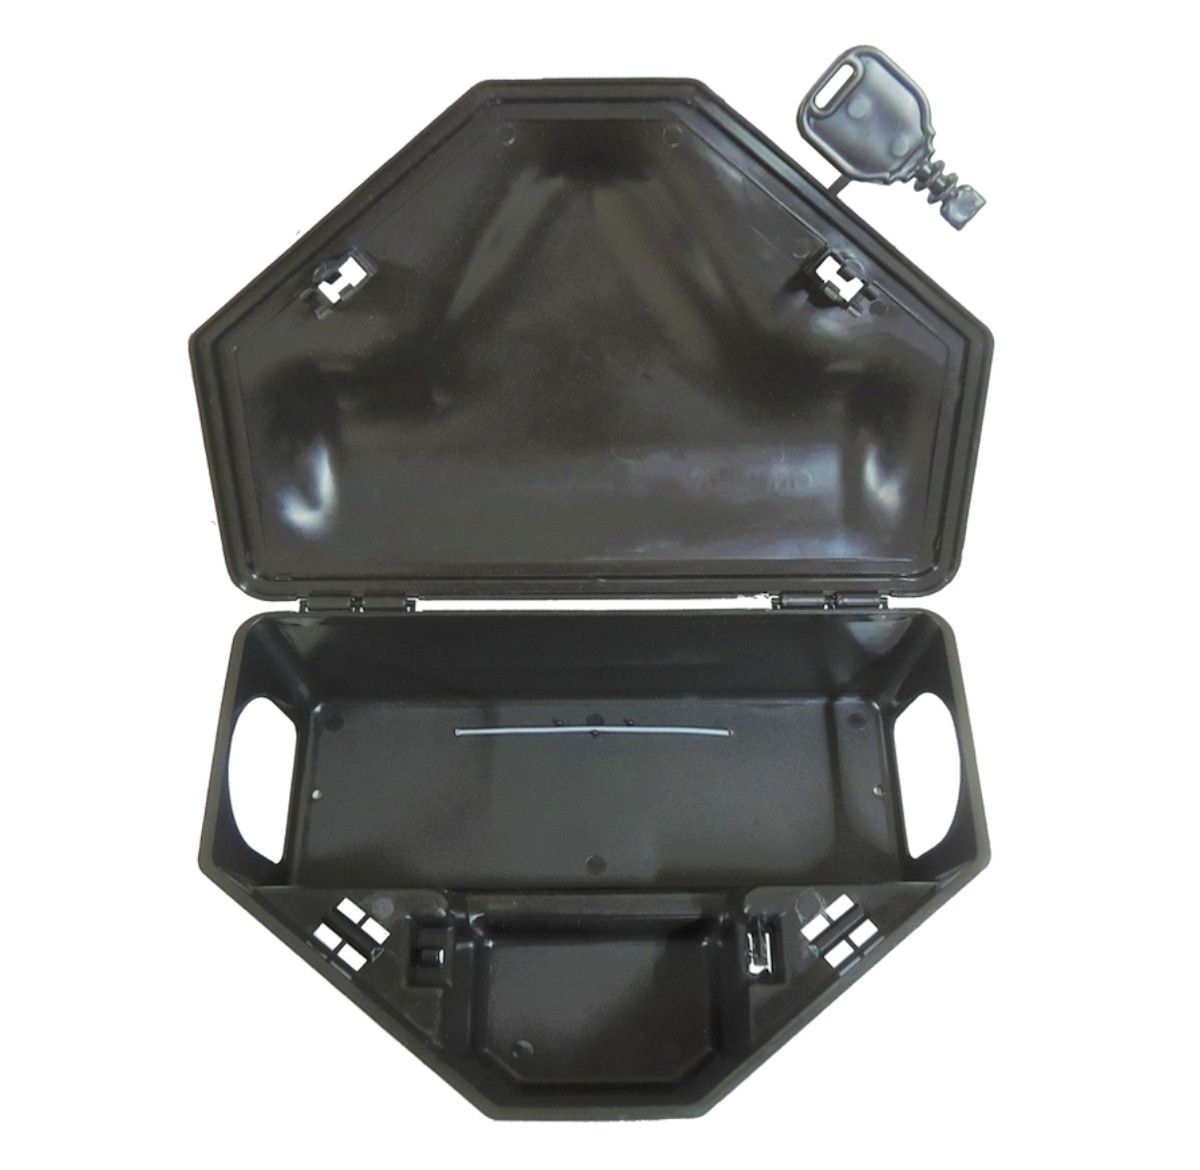 Kit 42 Porta Isca Com 2 Chaves - Duplo Travamento